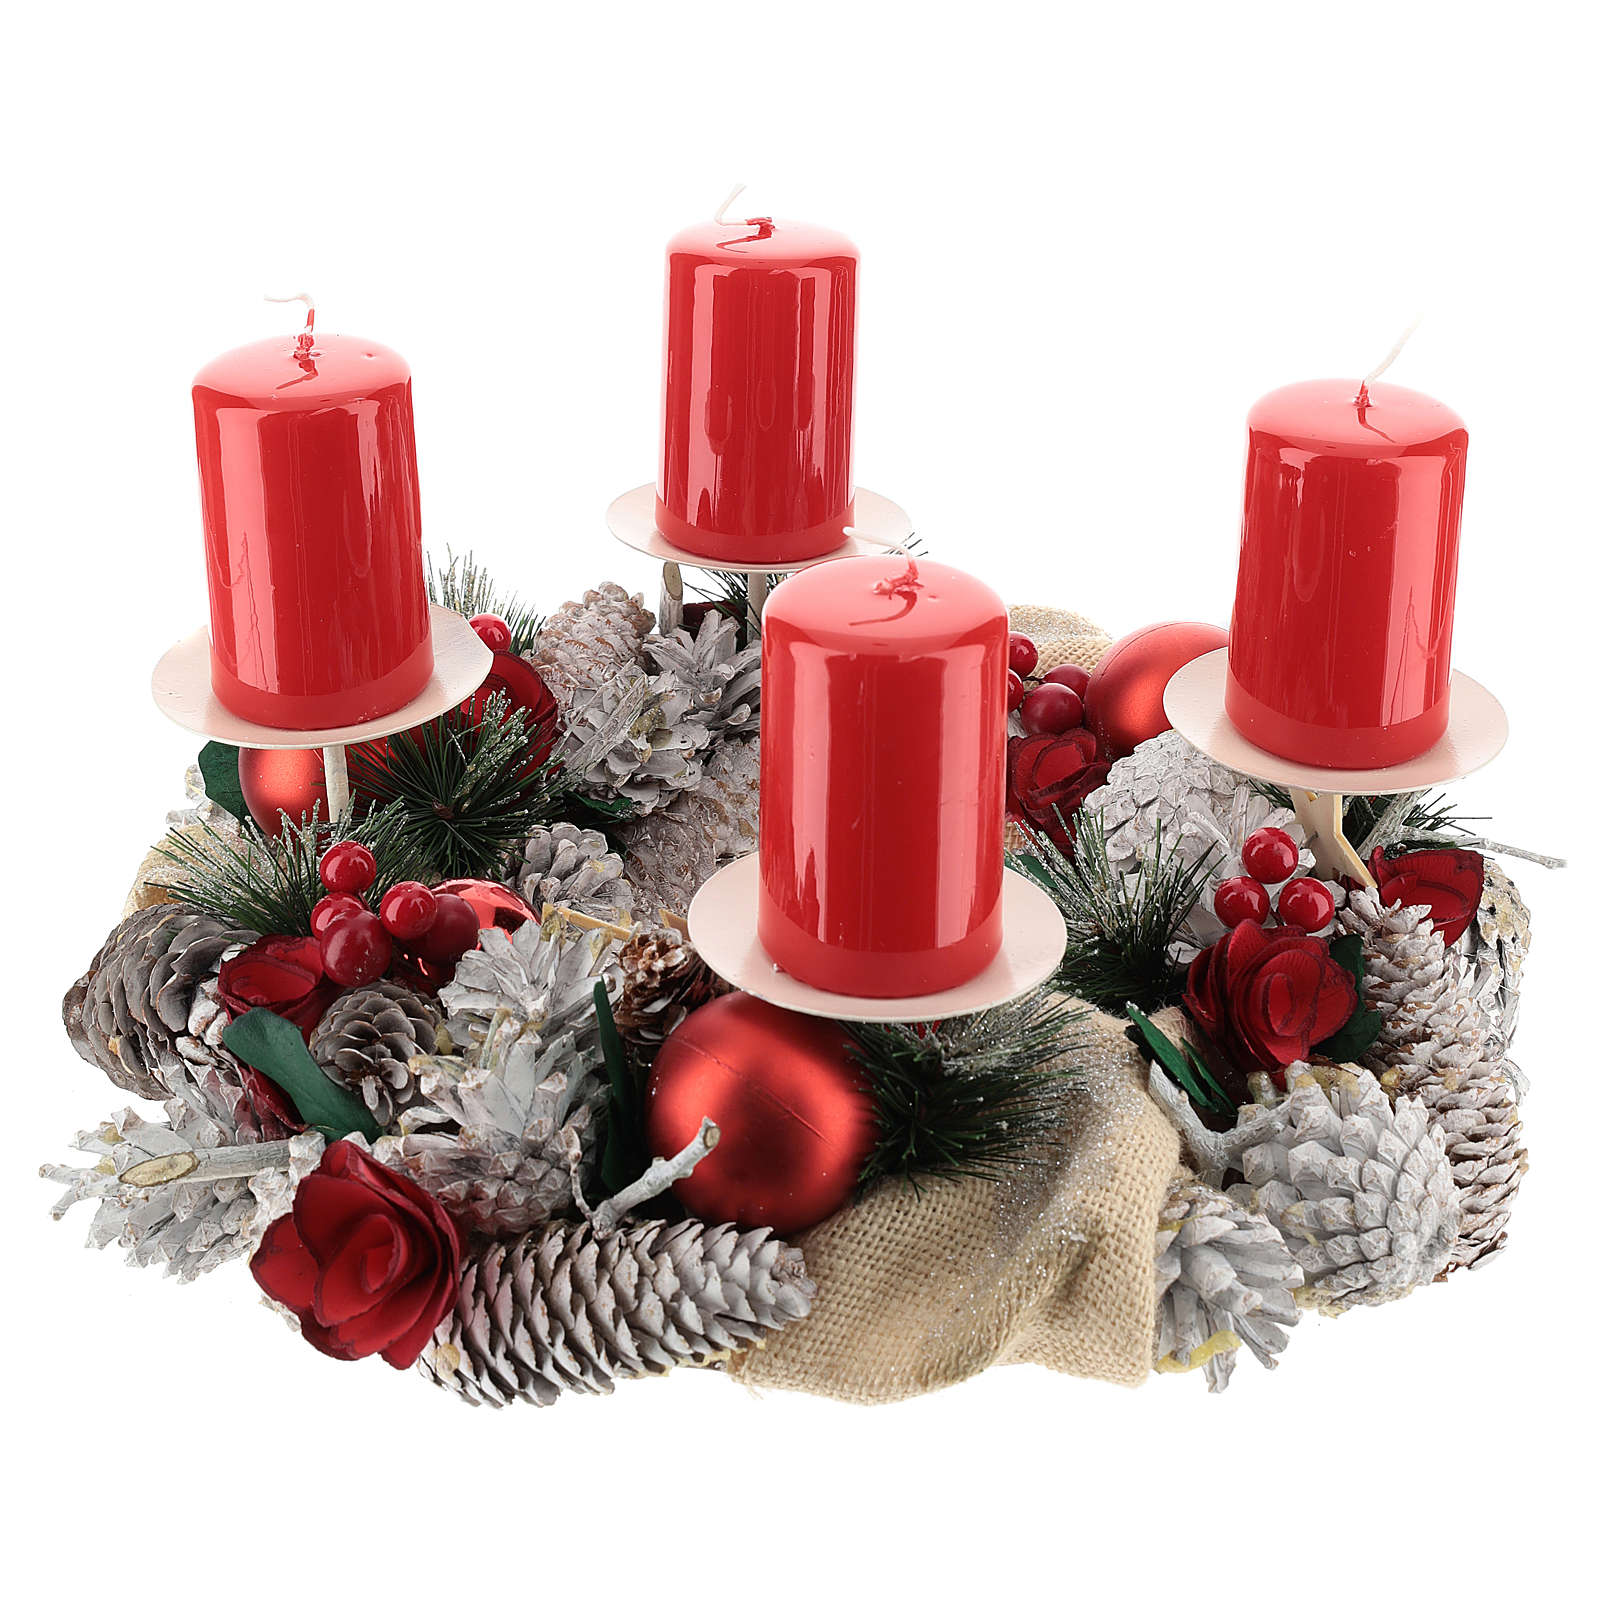 Kit avvento corona natalizia innevata bacche rosse punzoni bianchi candele rosse 3